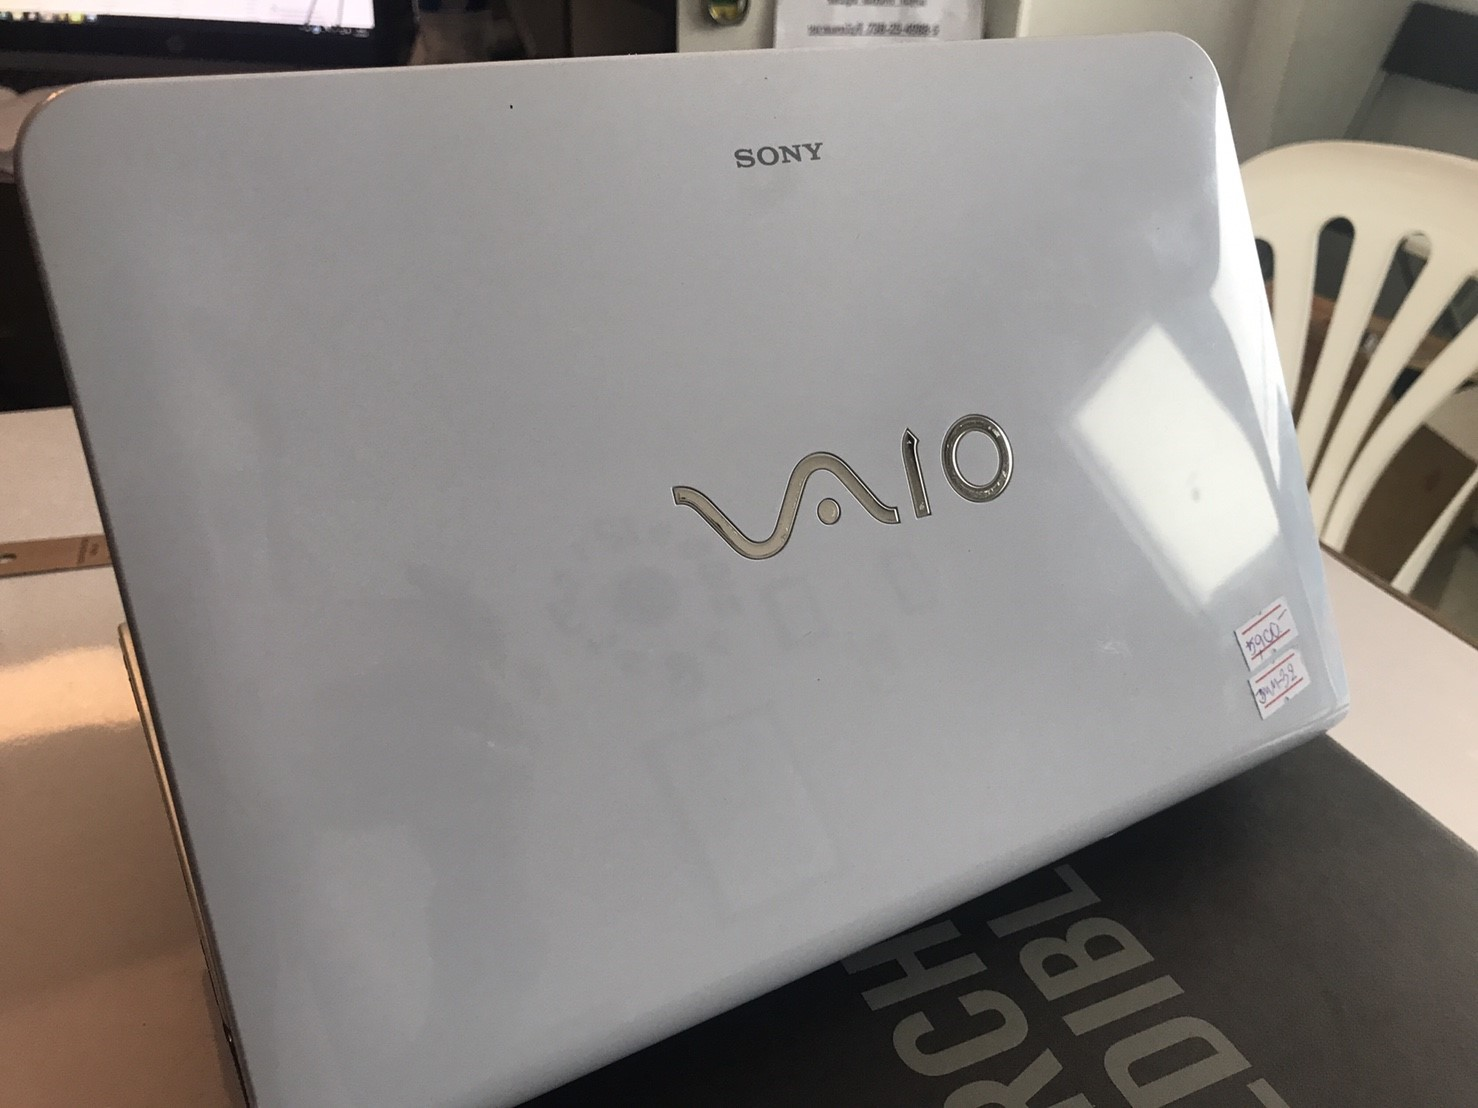 JMM-32 ขาย โน๊ตบุ๊ค Sony Vaio E-Series SVE11135CHW สีขาว